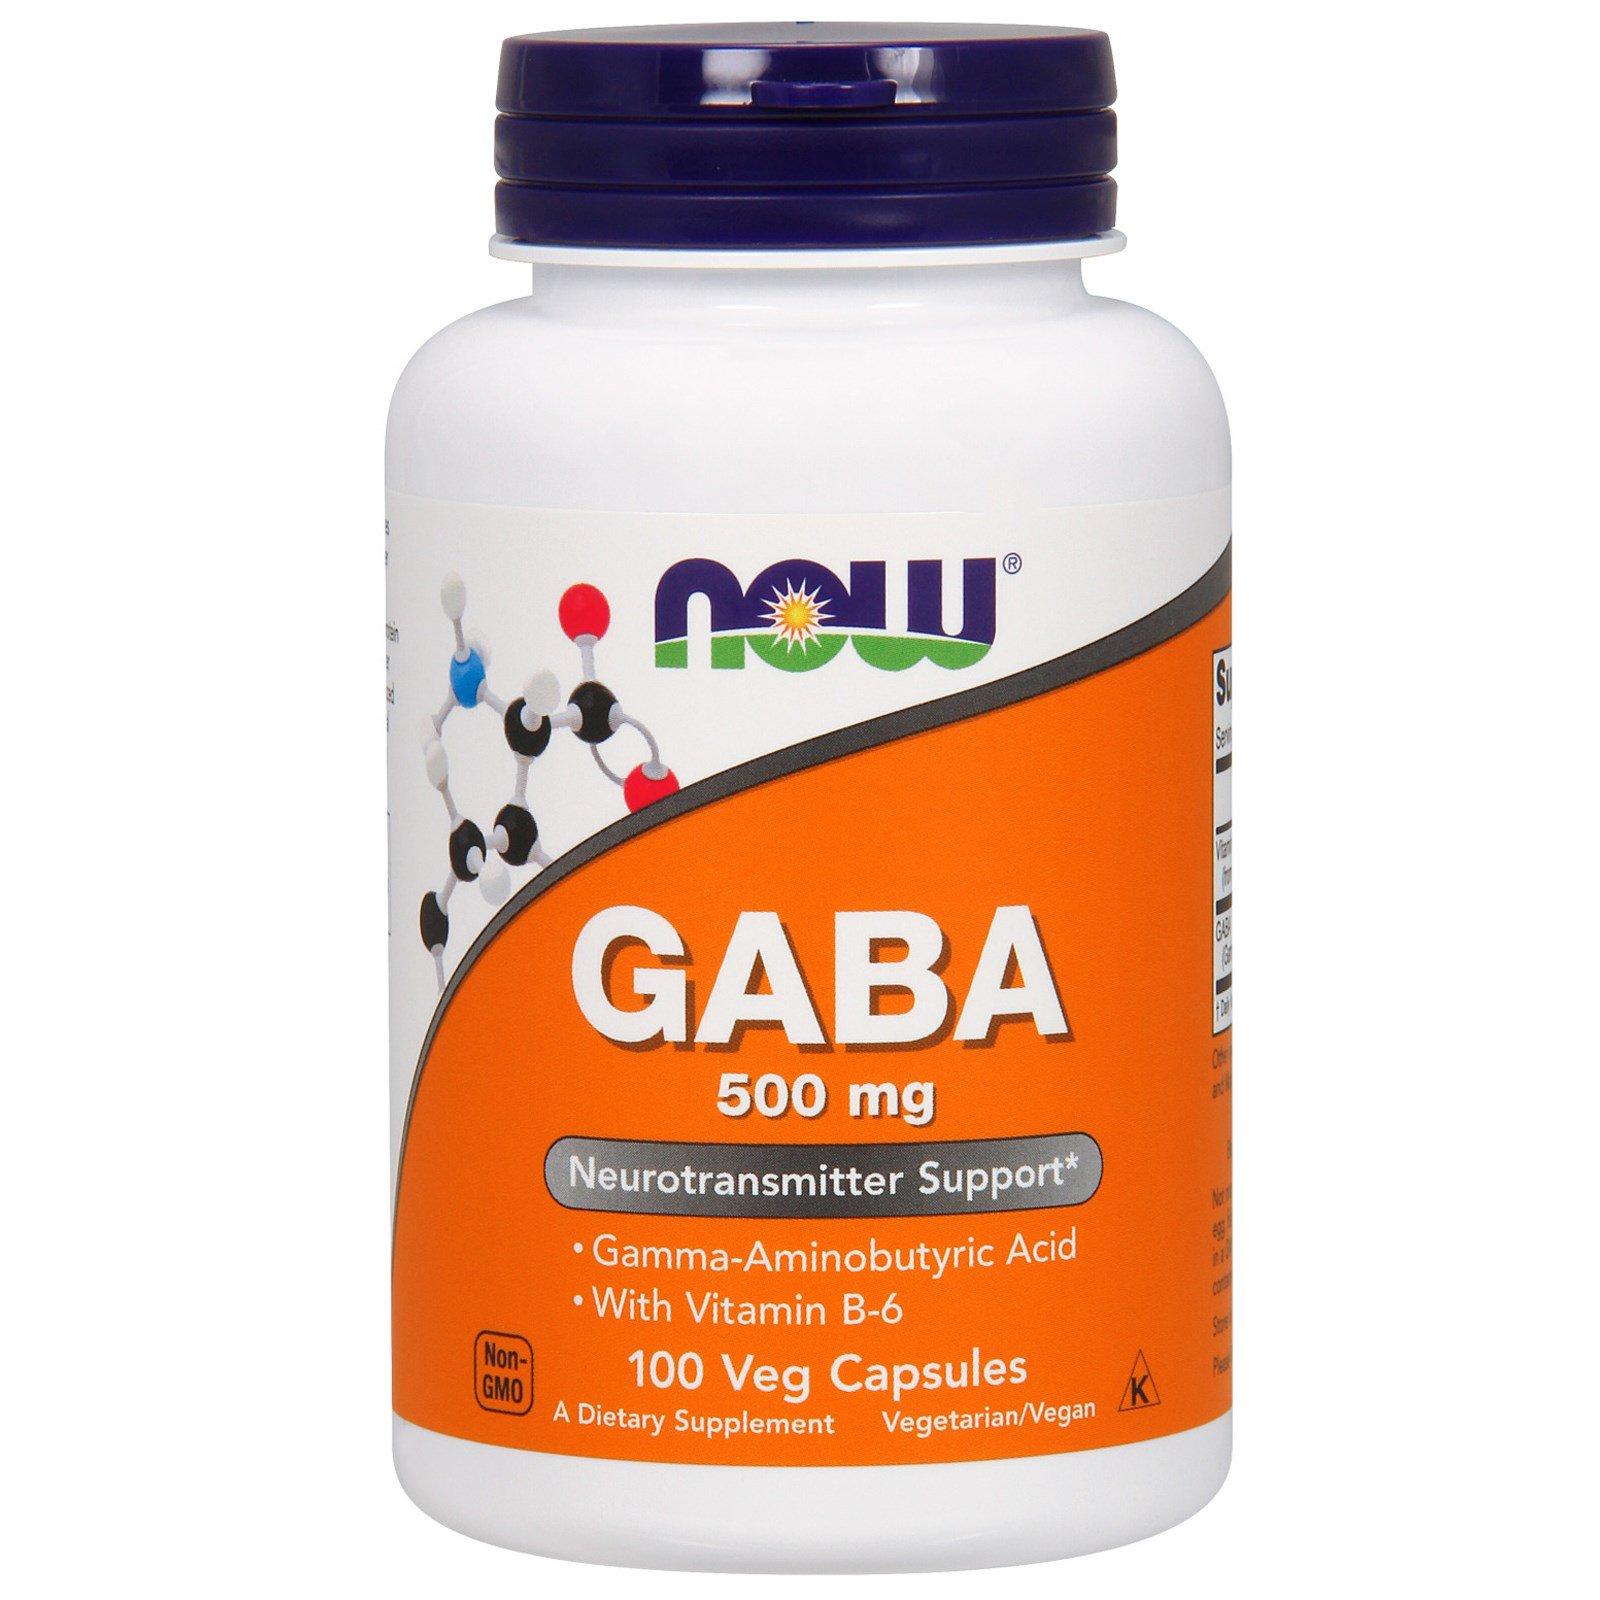 Now Foods, GABA, 500 mg, 100 pflanzliche KapselnNow Foods, GABA, 500 mg, 100 pflanzliche KapselnNow Foods, GABA, 500 mg, 100 pflanzliche KapselnWichtige Hinweise